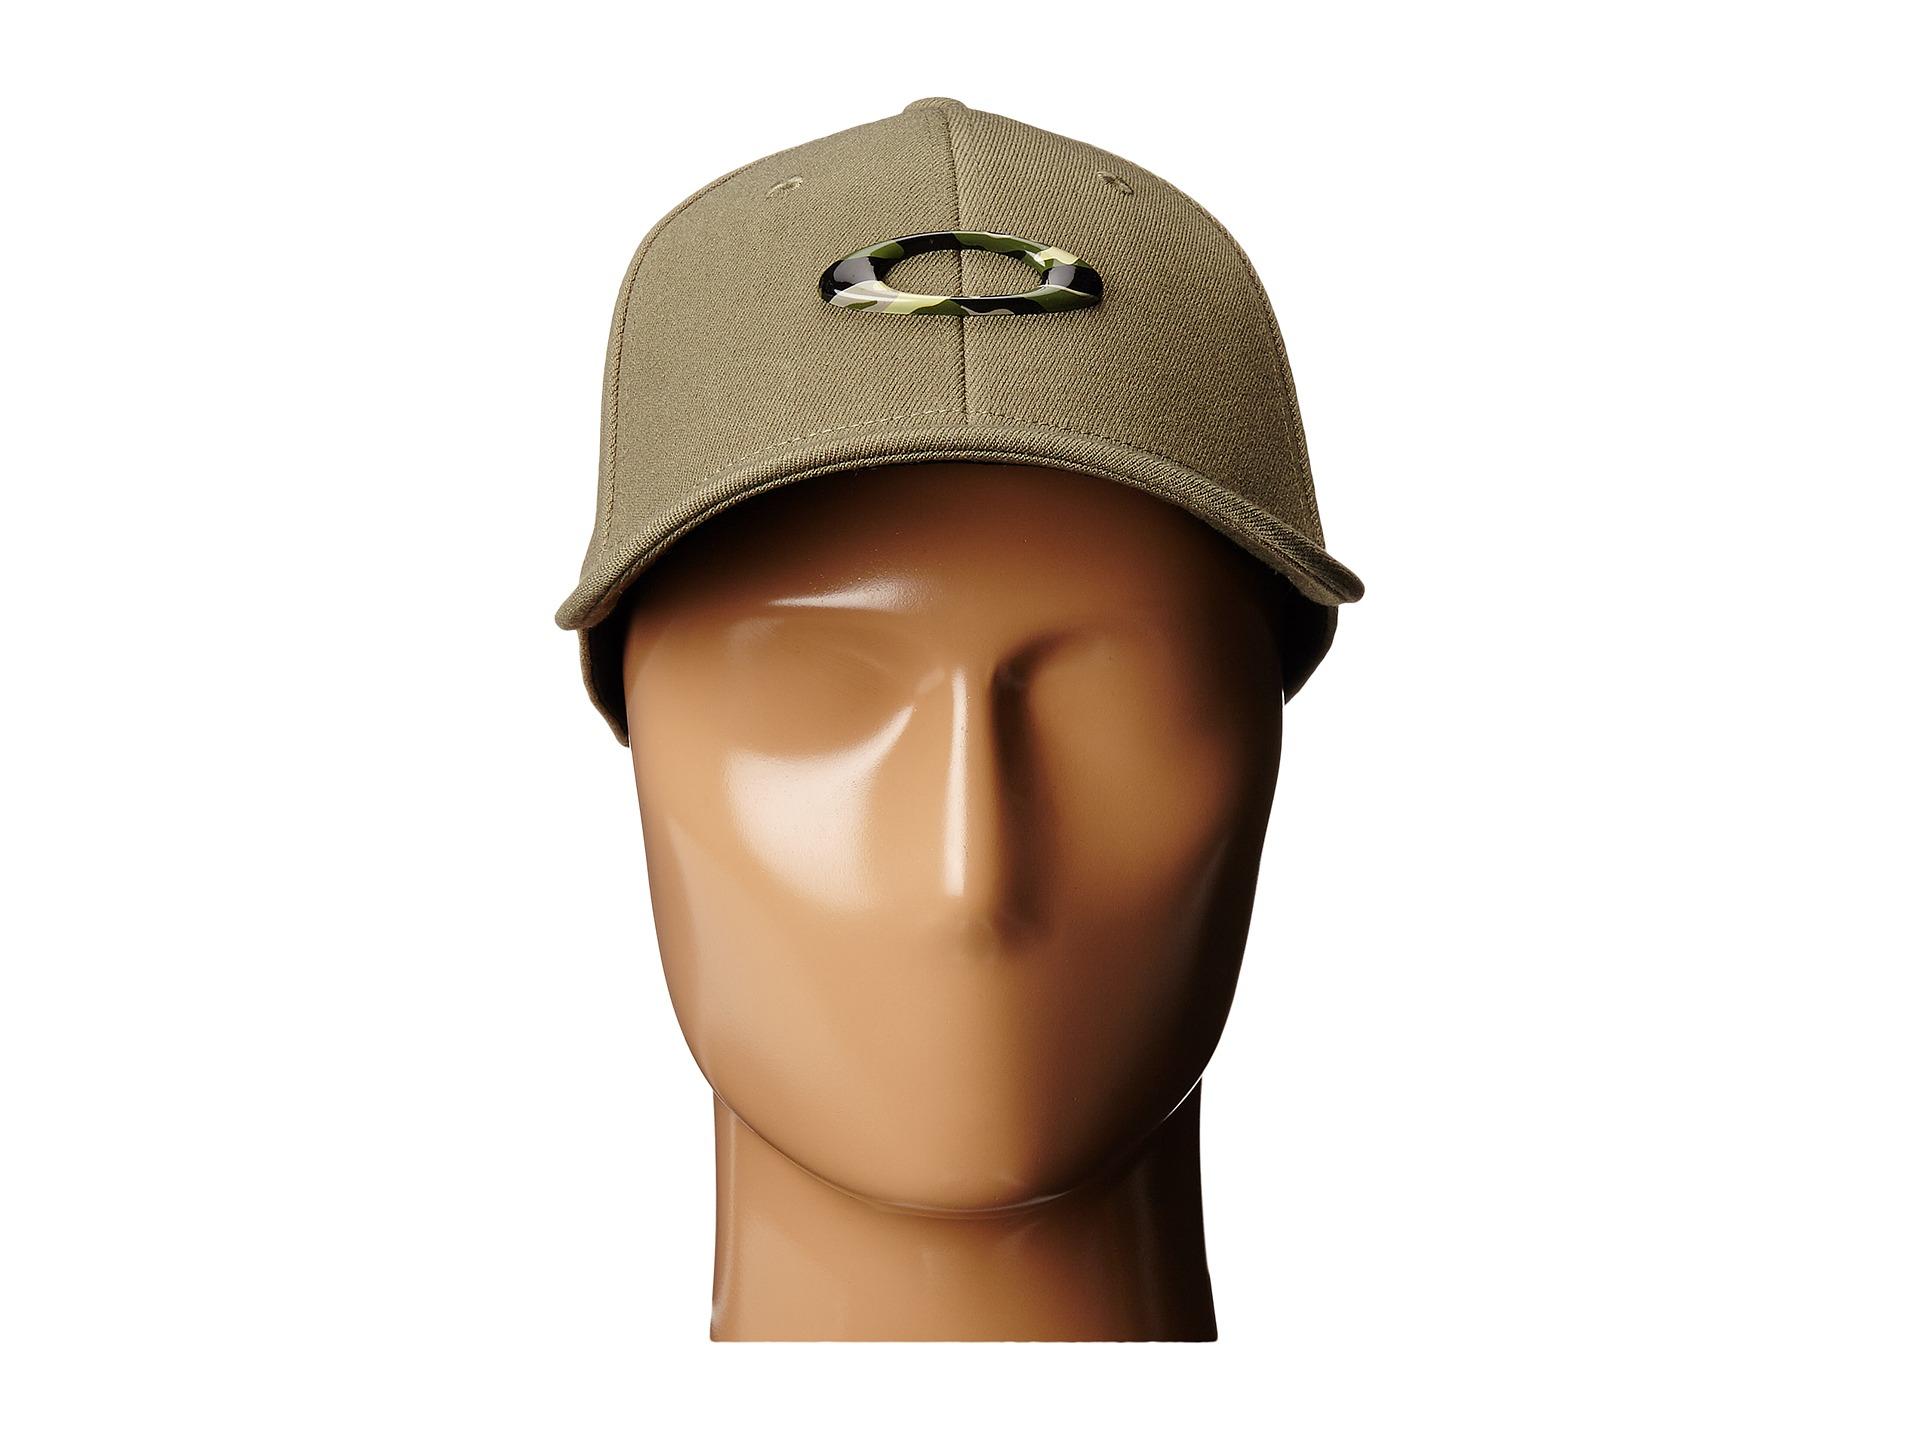 new style 57fe5 d7b82 ... promo code oakley camo hat b06f6 bb626